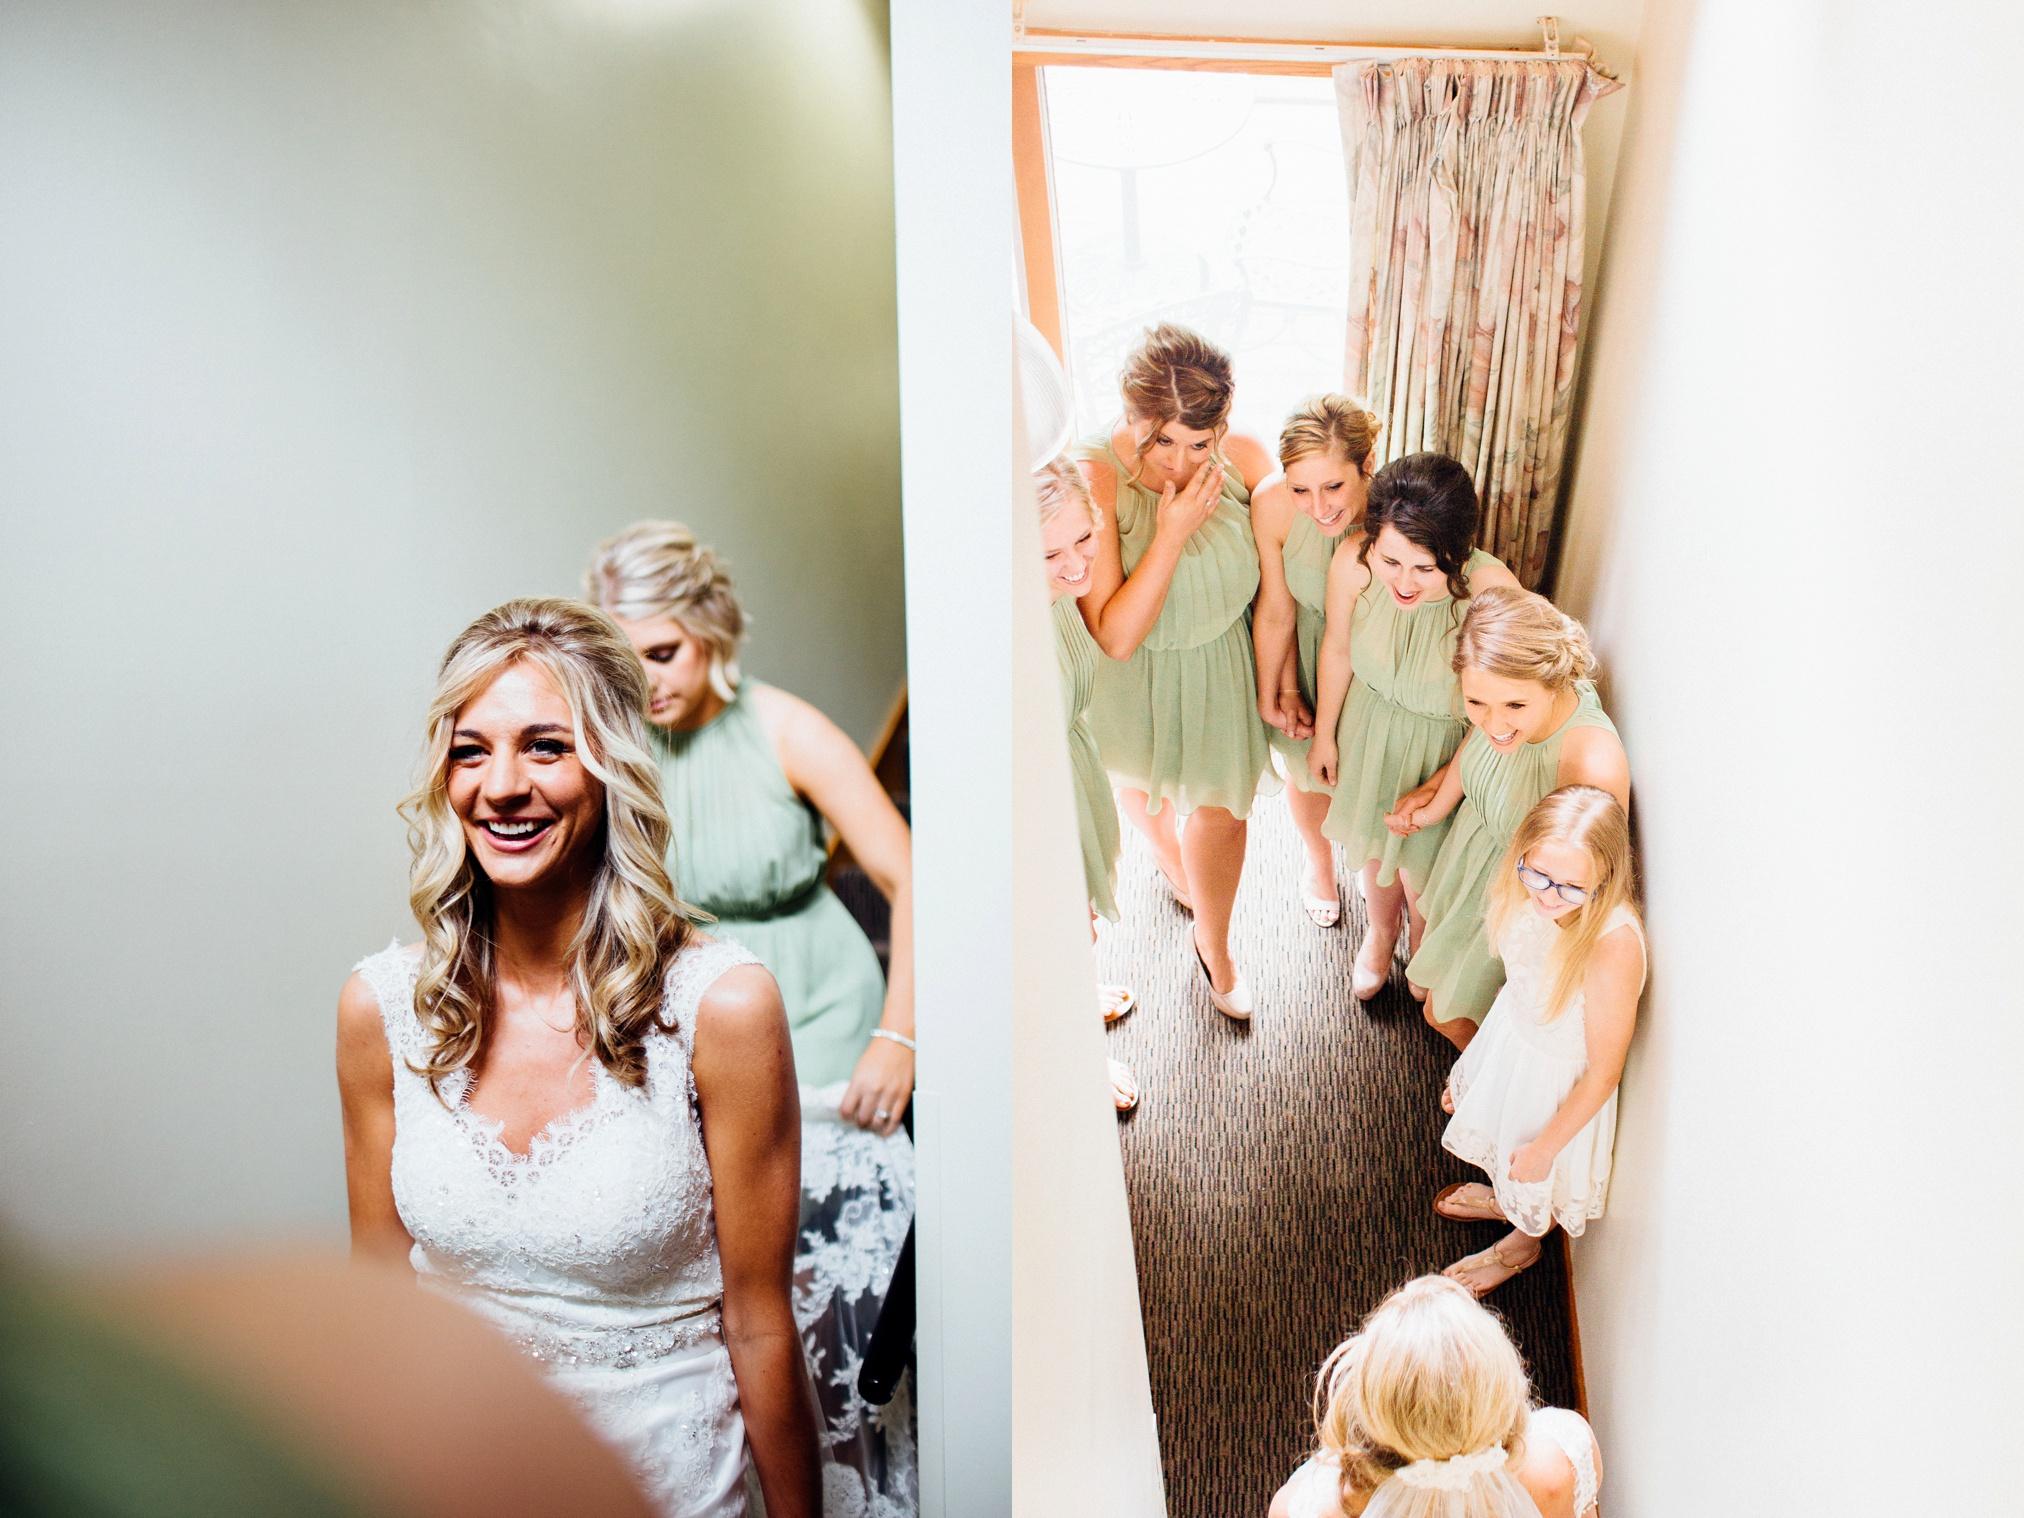 schmid_wedding-85.jpg